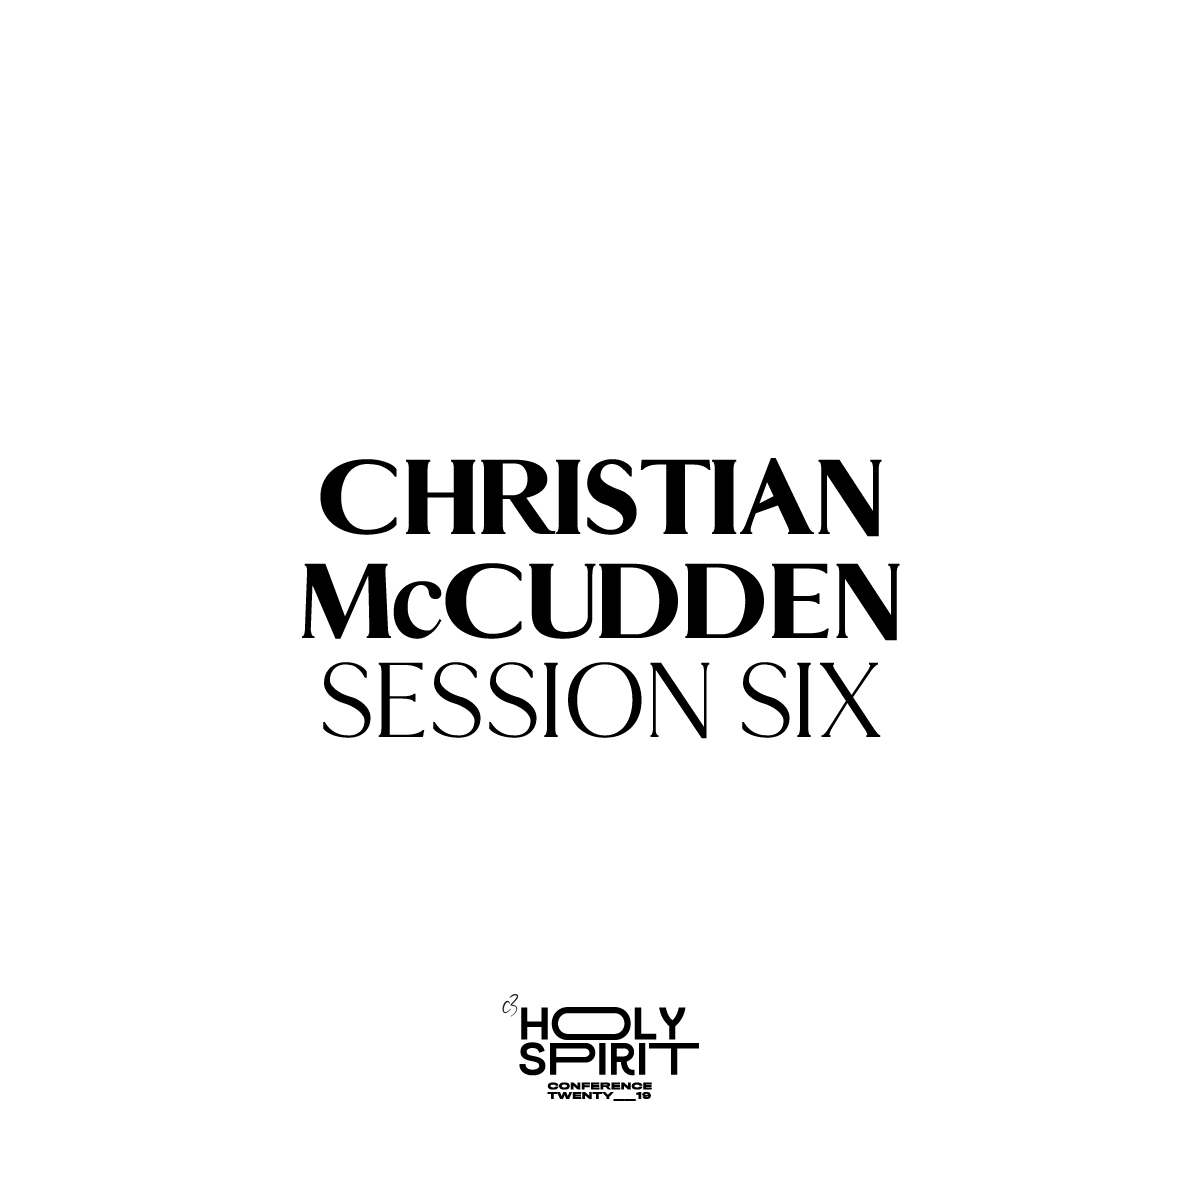 Session 6 - Christian McCudden